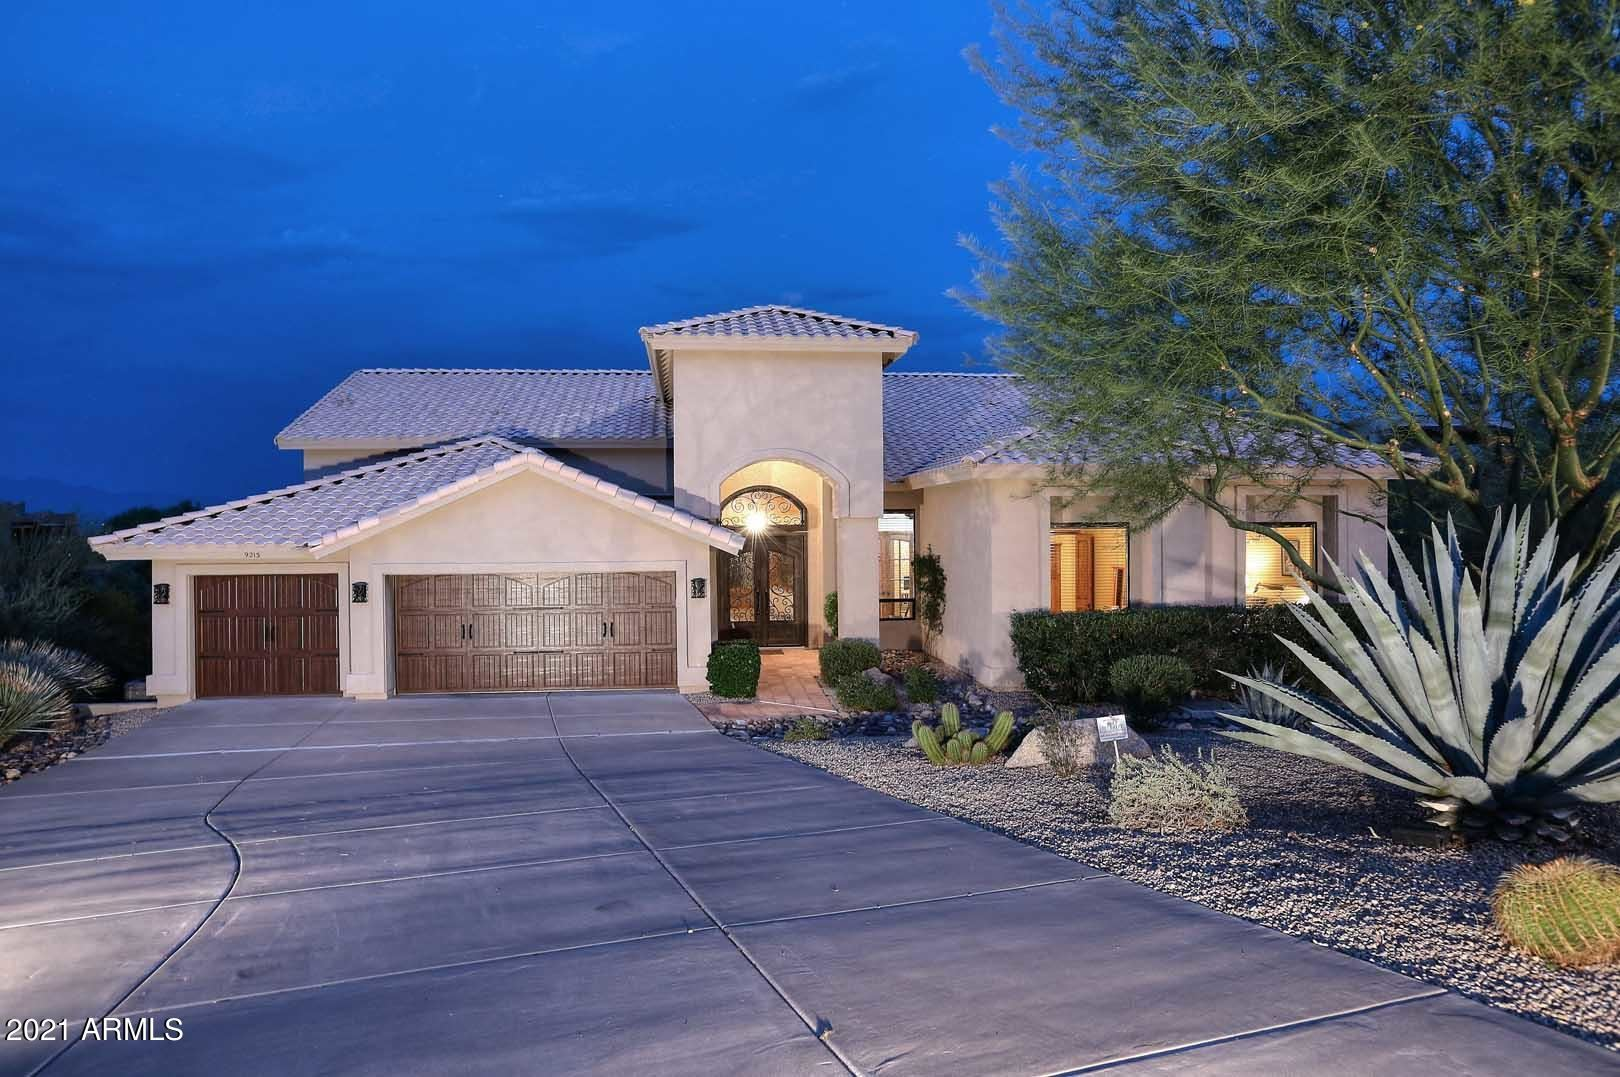 Photo of 9213 N LEO Drive, Fountain Hills, AZ 85268 (MLS # 6265693)